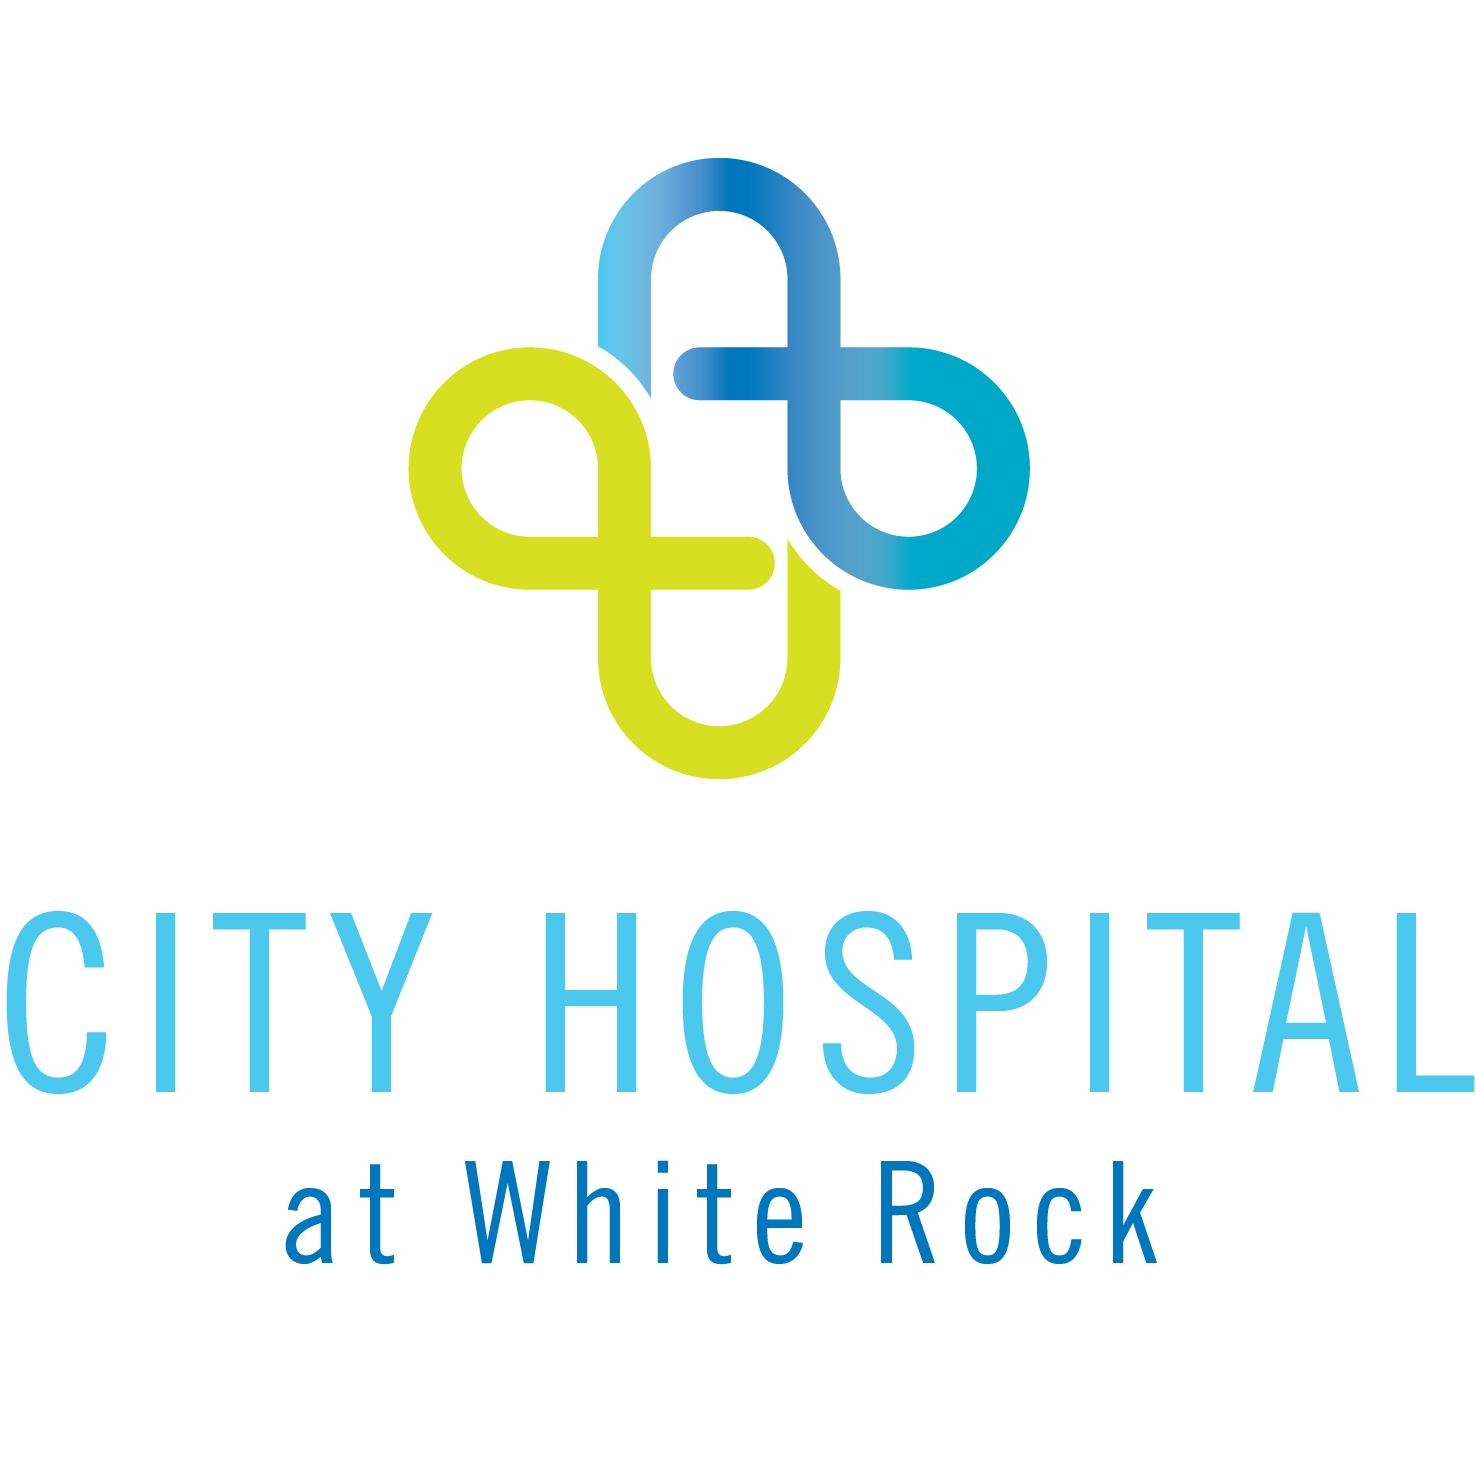 City Hospital at White Rock - Dallas, TX - Hospitals